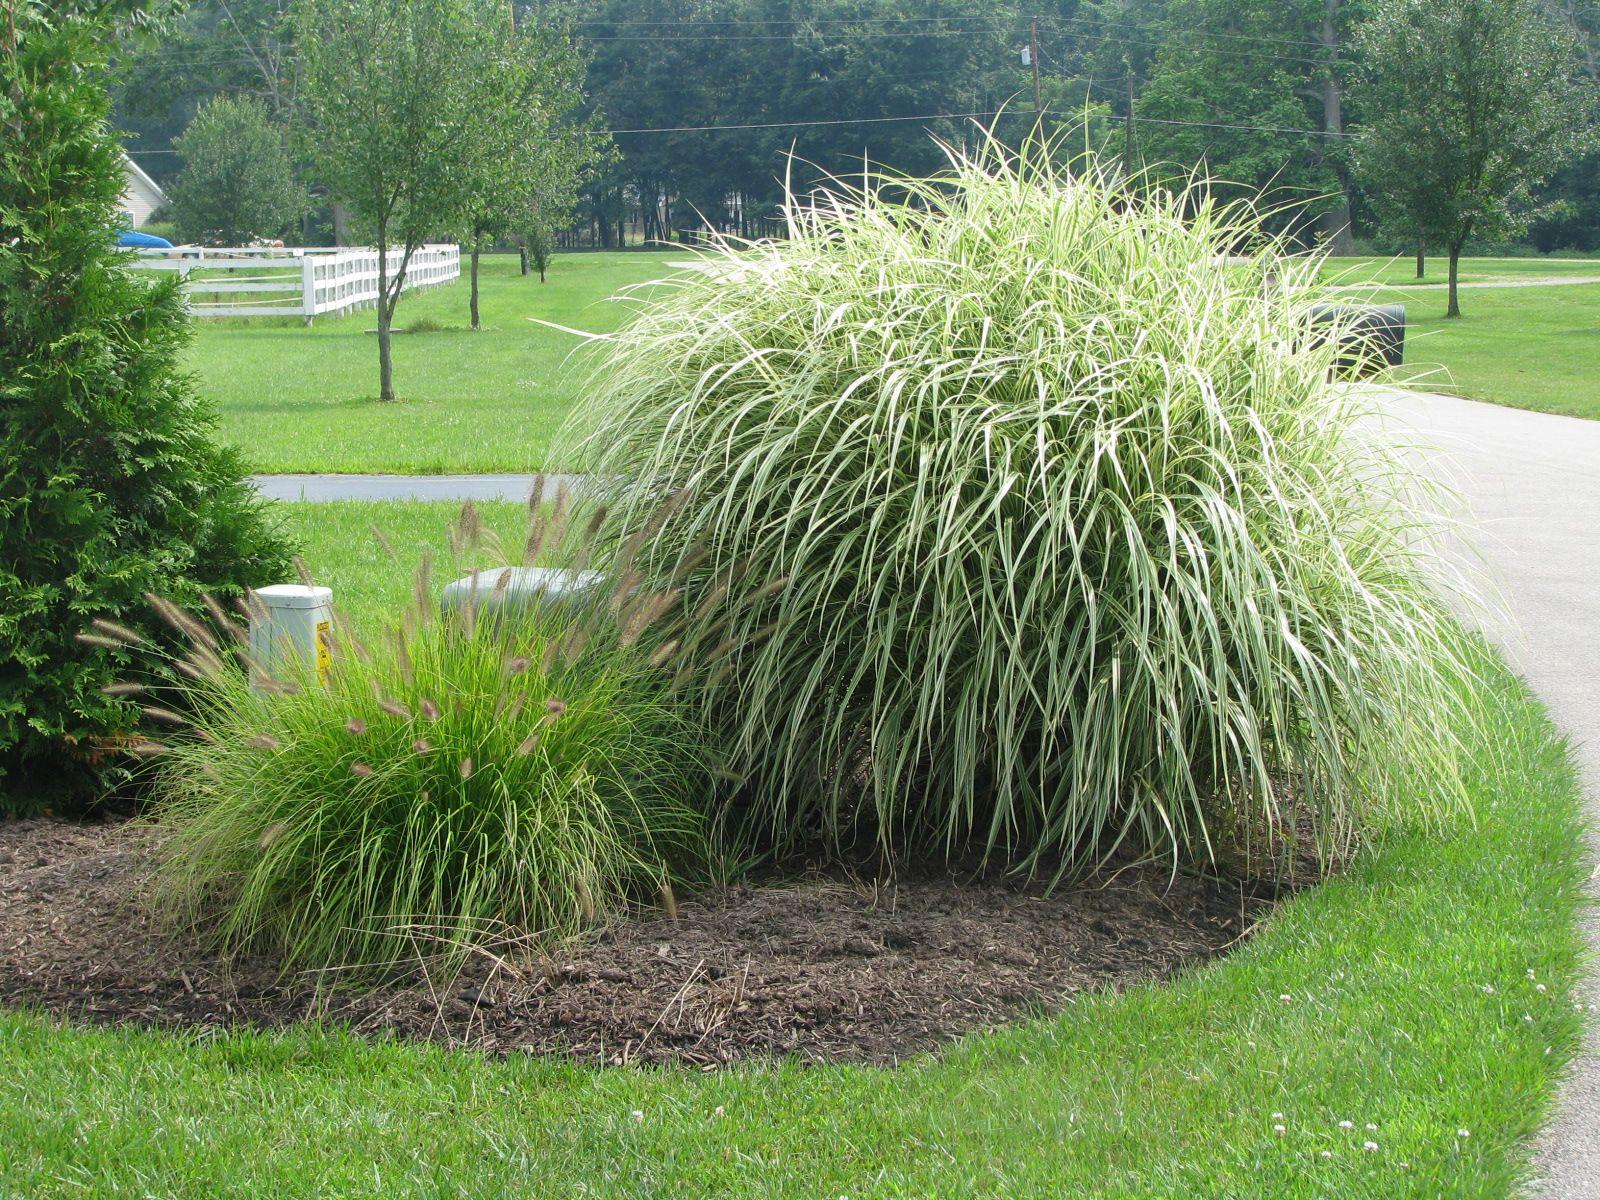 Gardeing with ornamental grass ornamental grass or grasses garden gardeing with ornamental grass ornamental grass or grasses garden directory nursery source finder workwithnaturefo